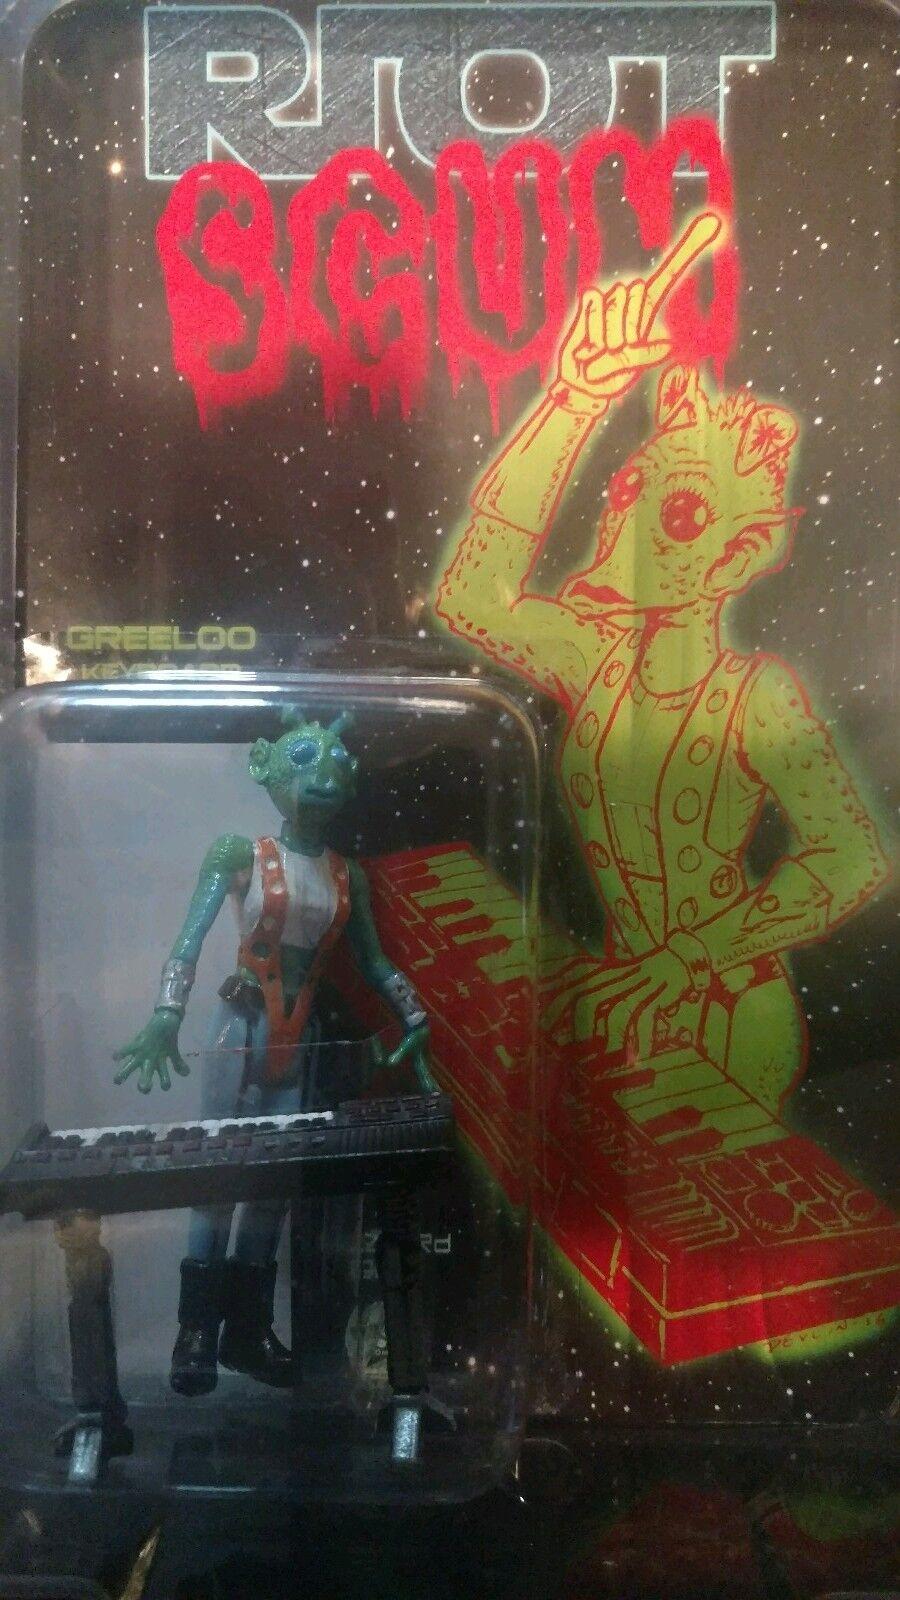 Star Wars GREELOO RIOT SCUM BUZZARD GUTS KEYBOARD DKE KILLER BOOTLEG SPECIAL ED